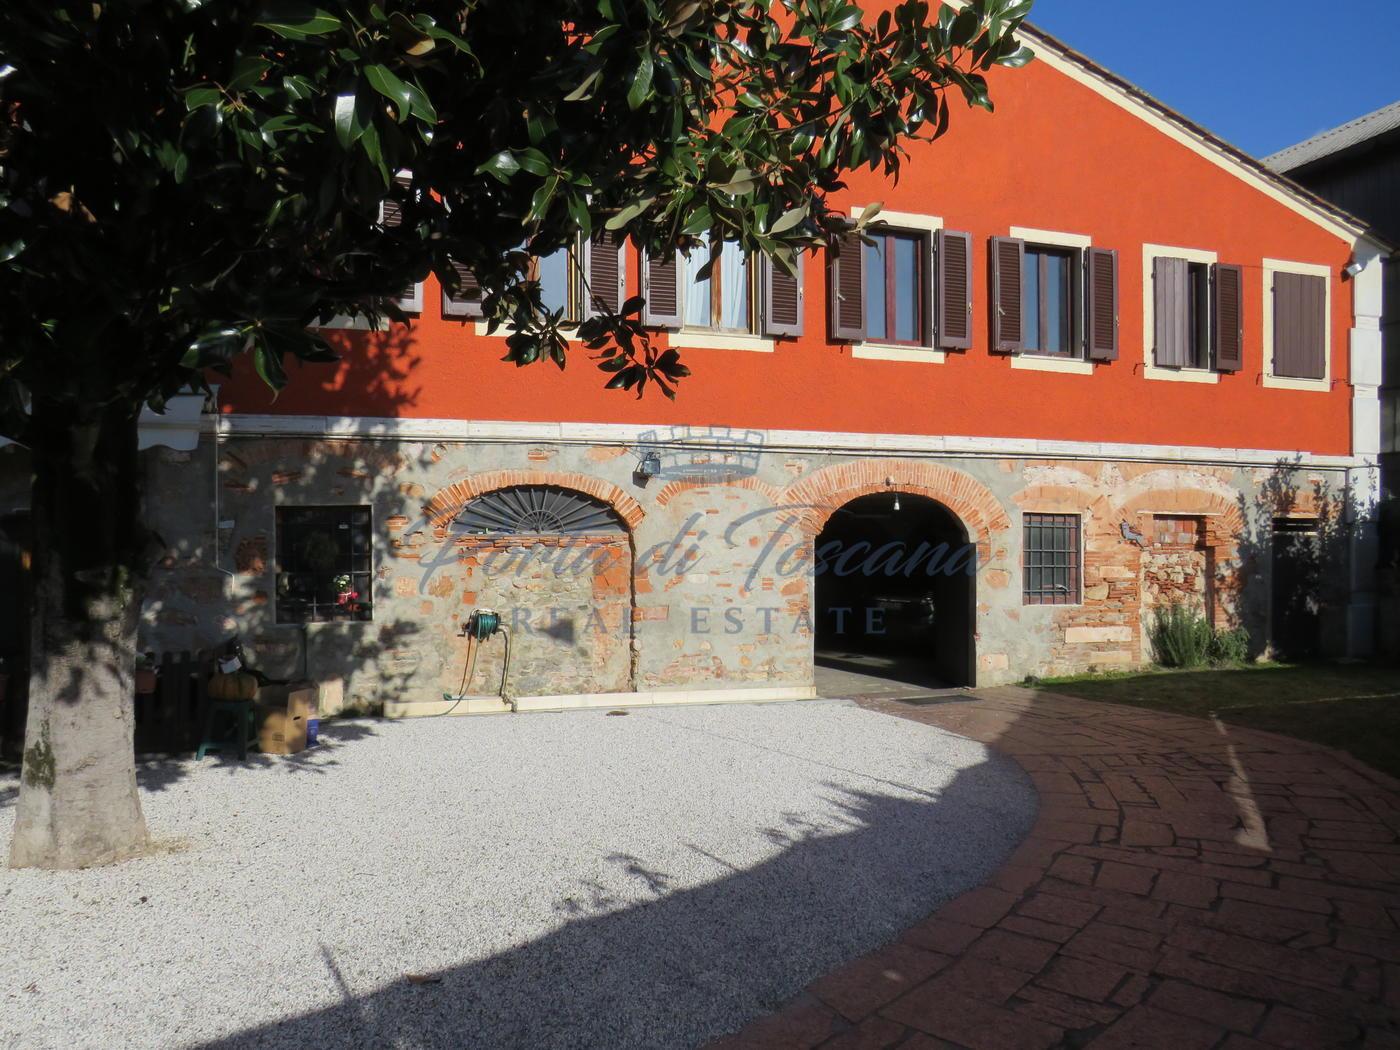 Appartamento di ampia metratura in vendita a Pietrasanta